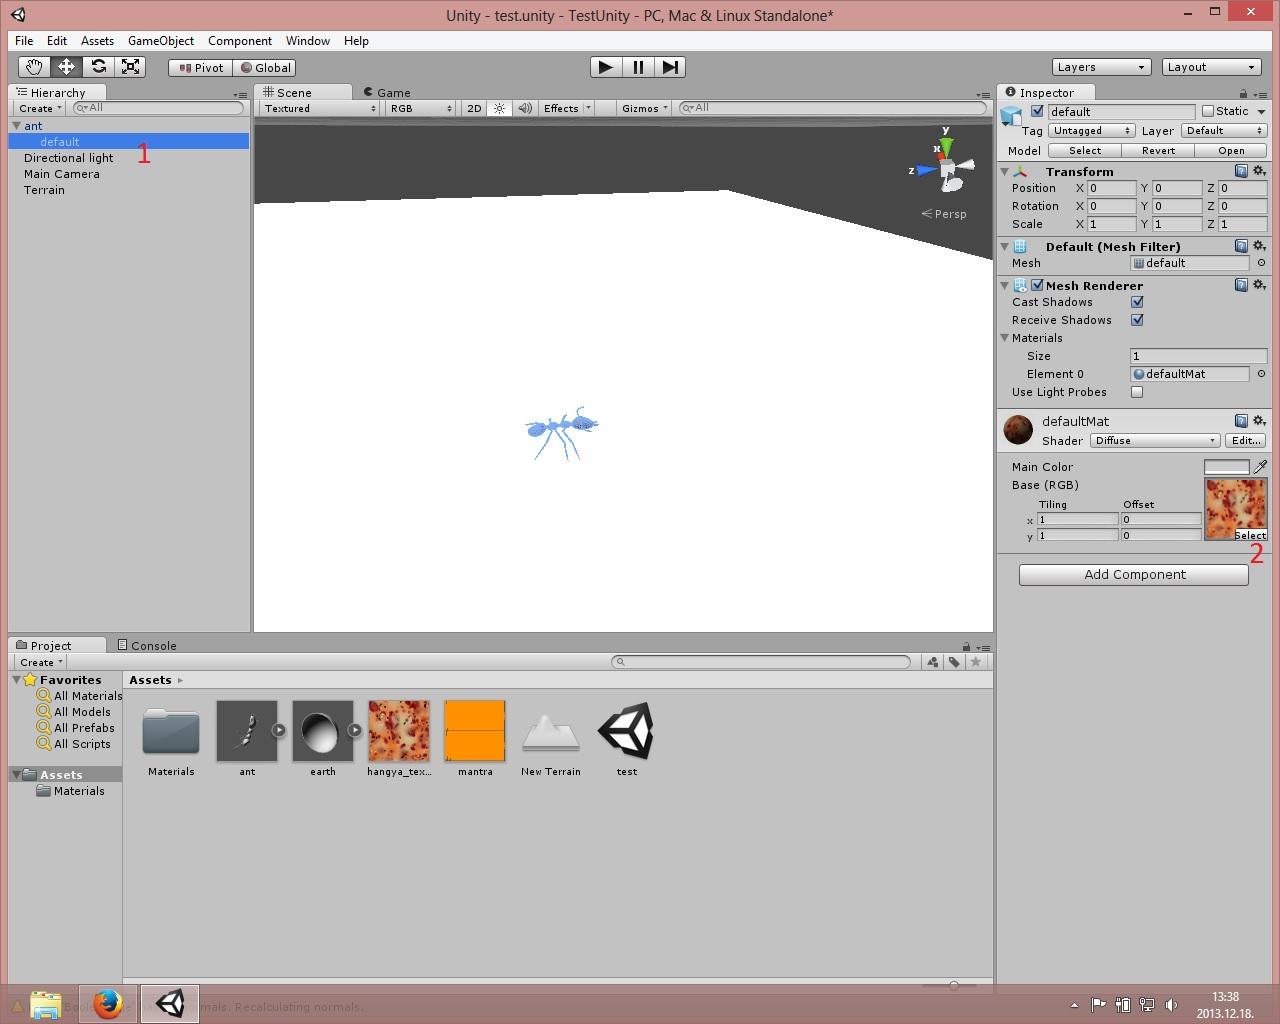 Unity scene editor